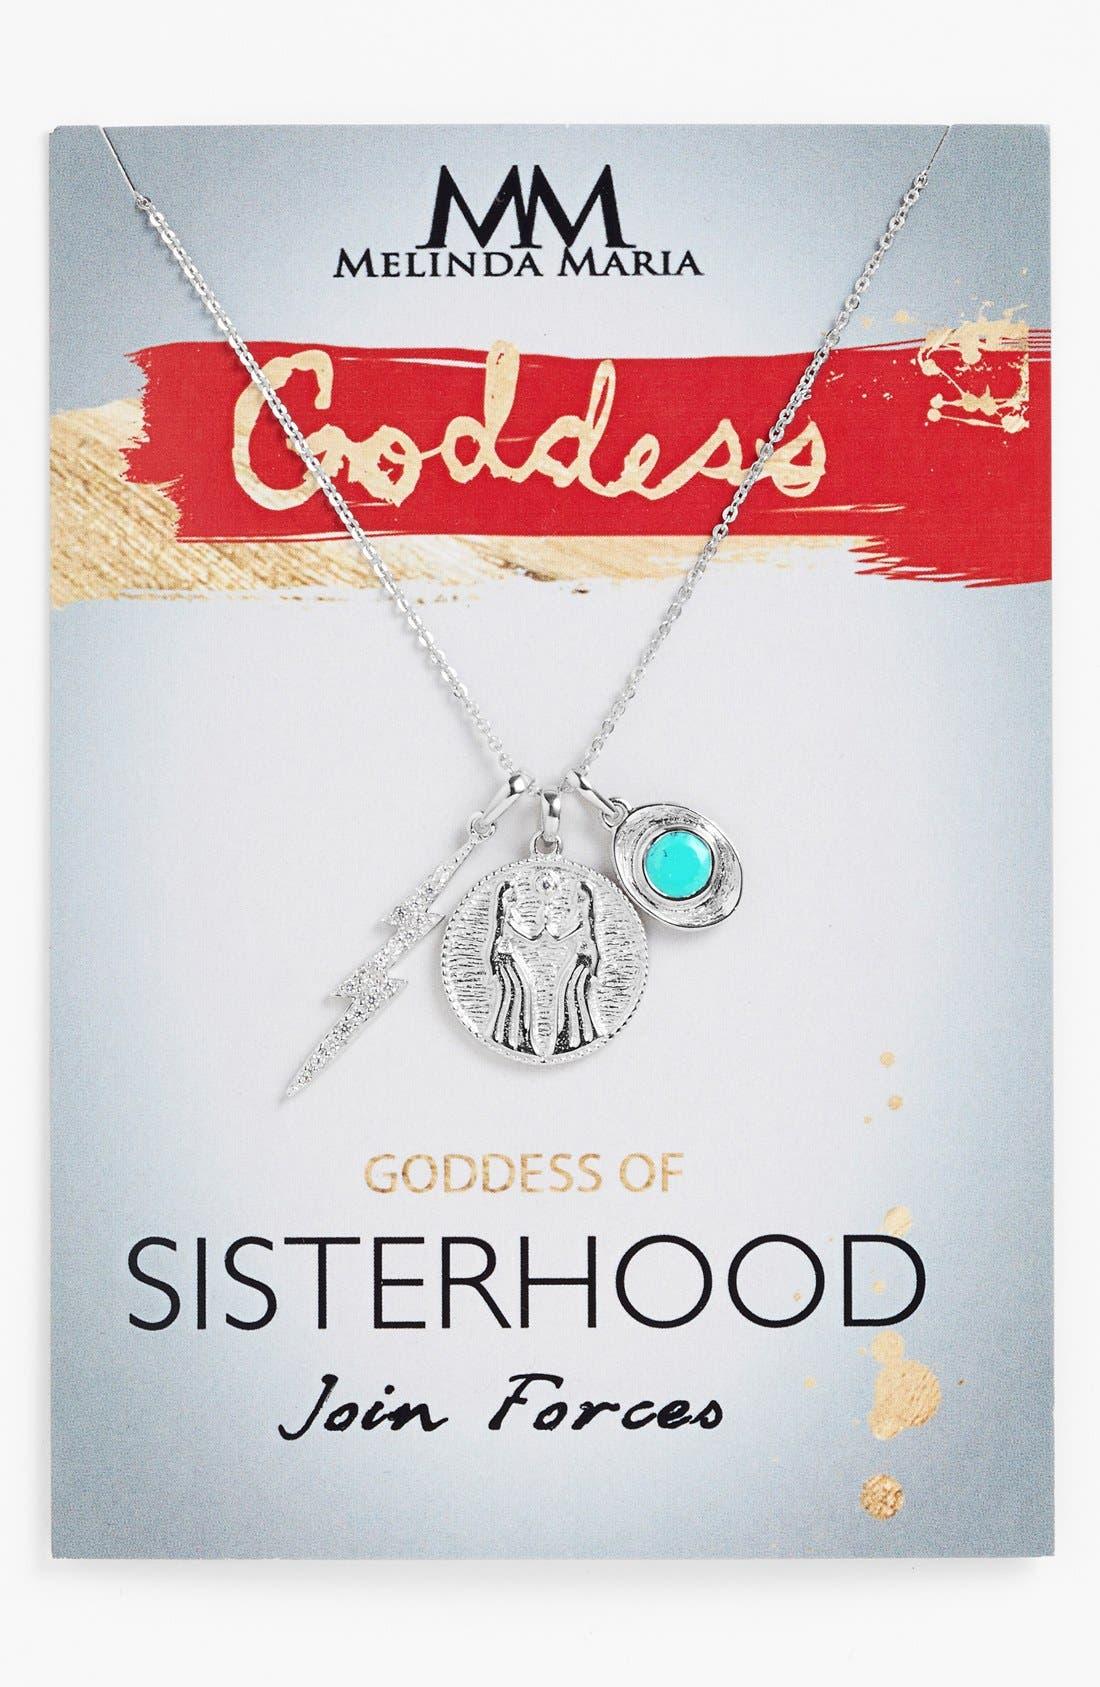 Alternate Image 1 Selected - Melinda Maria 'Goddess of Sisterhood' Boxed Cluster Pendant Necklace